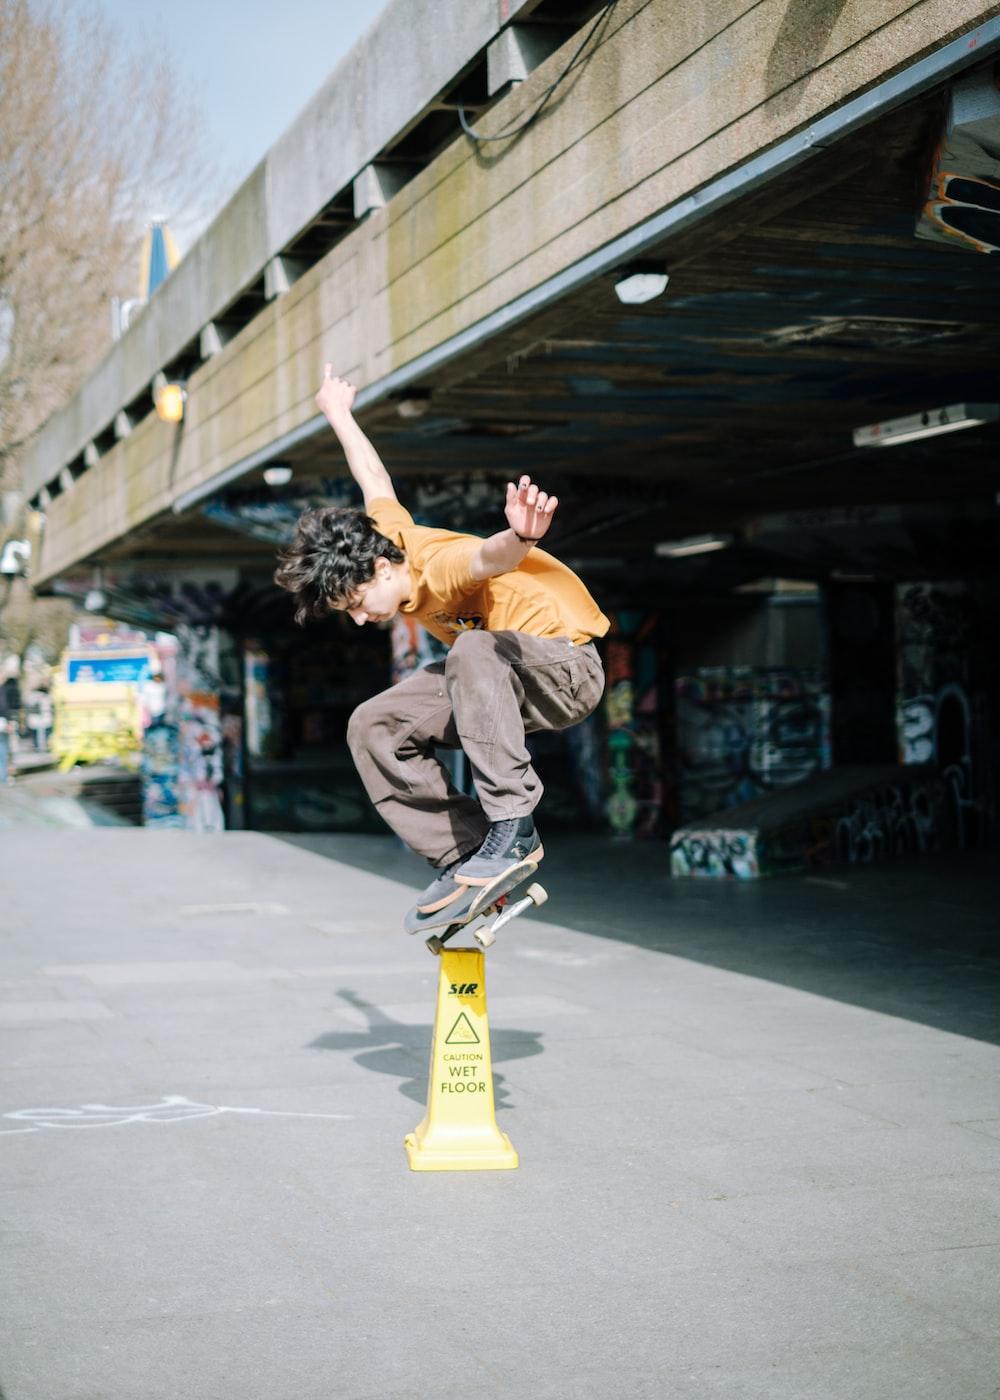 man in gray pants and black shirt doing skateboard stunts